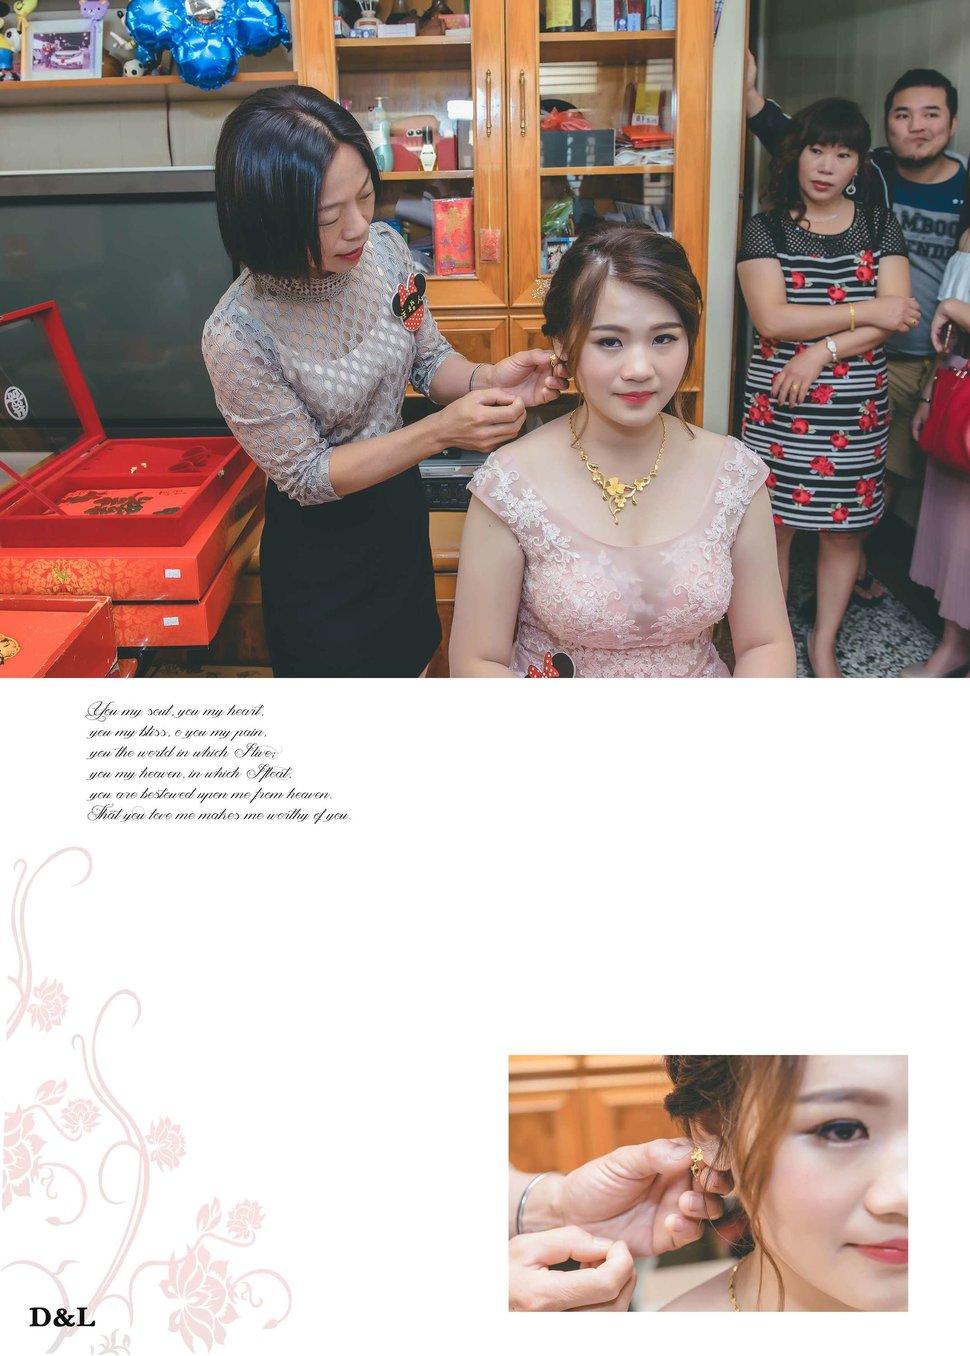 13 - D&L 婚禮事務 · 婚禮婚紗攝影 - 結婚吧